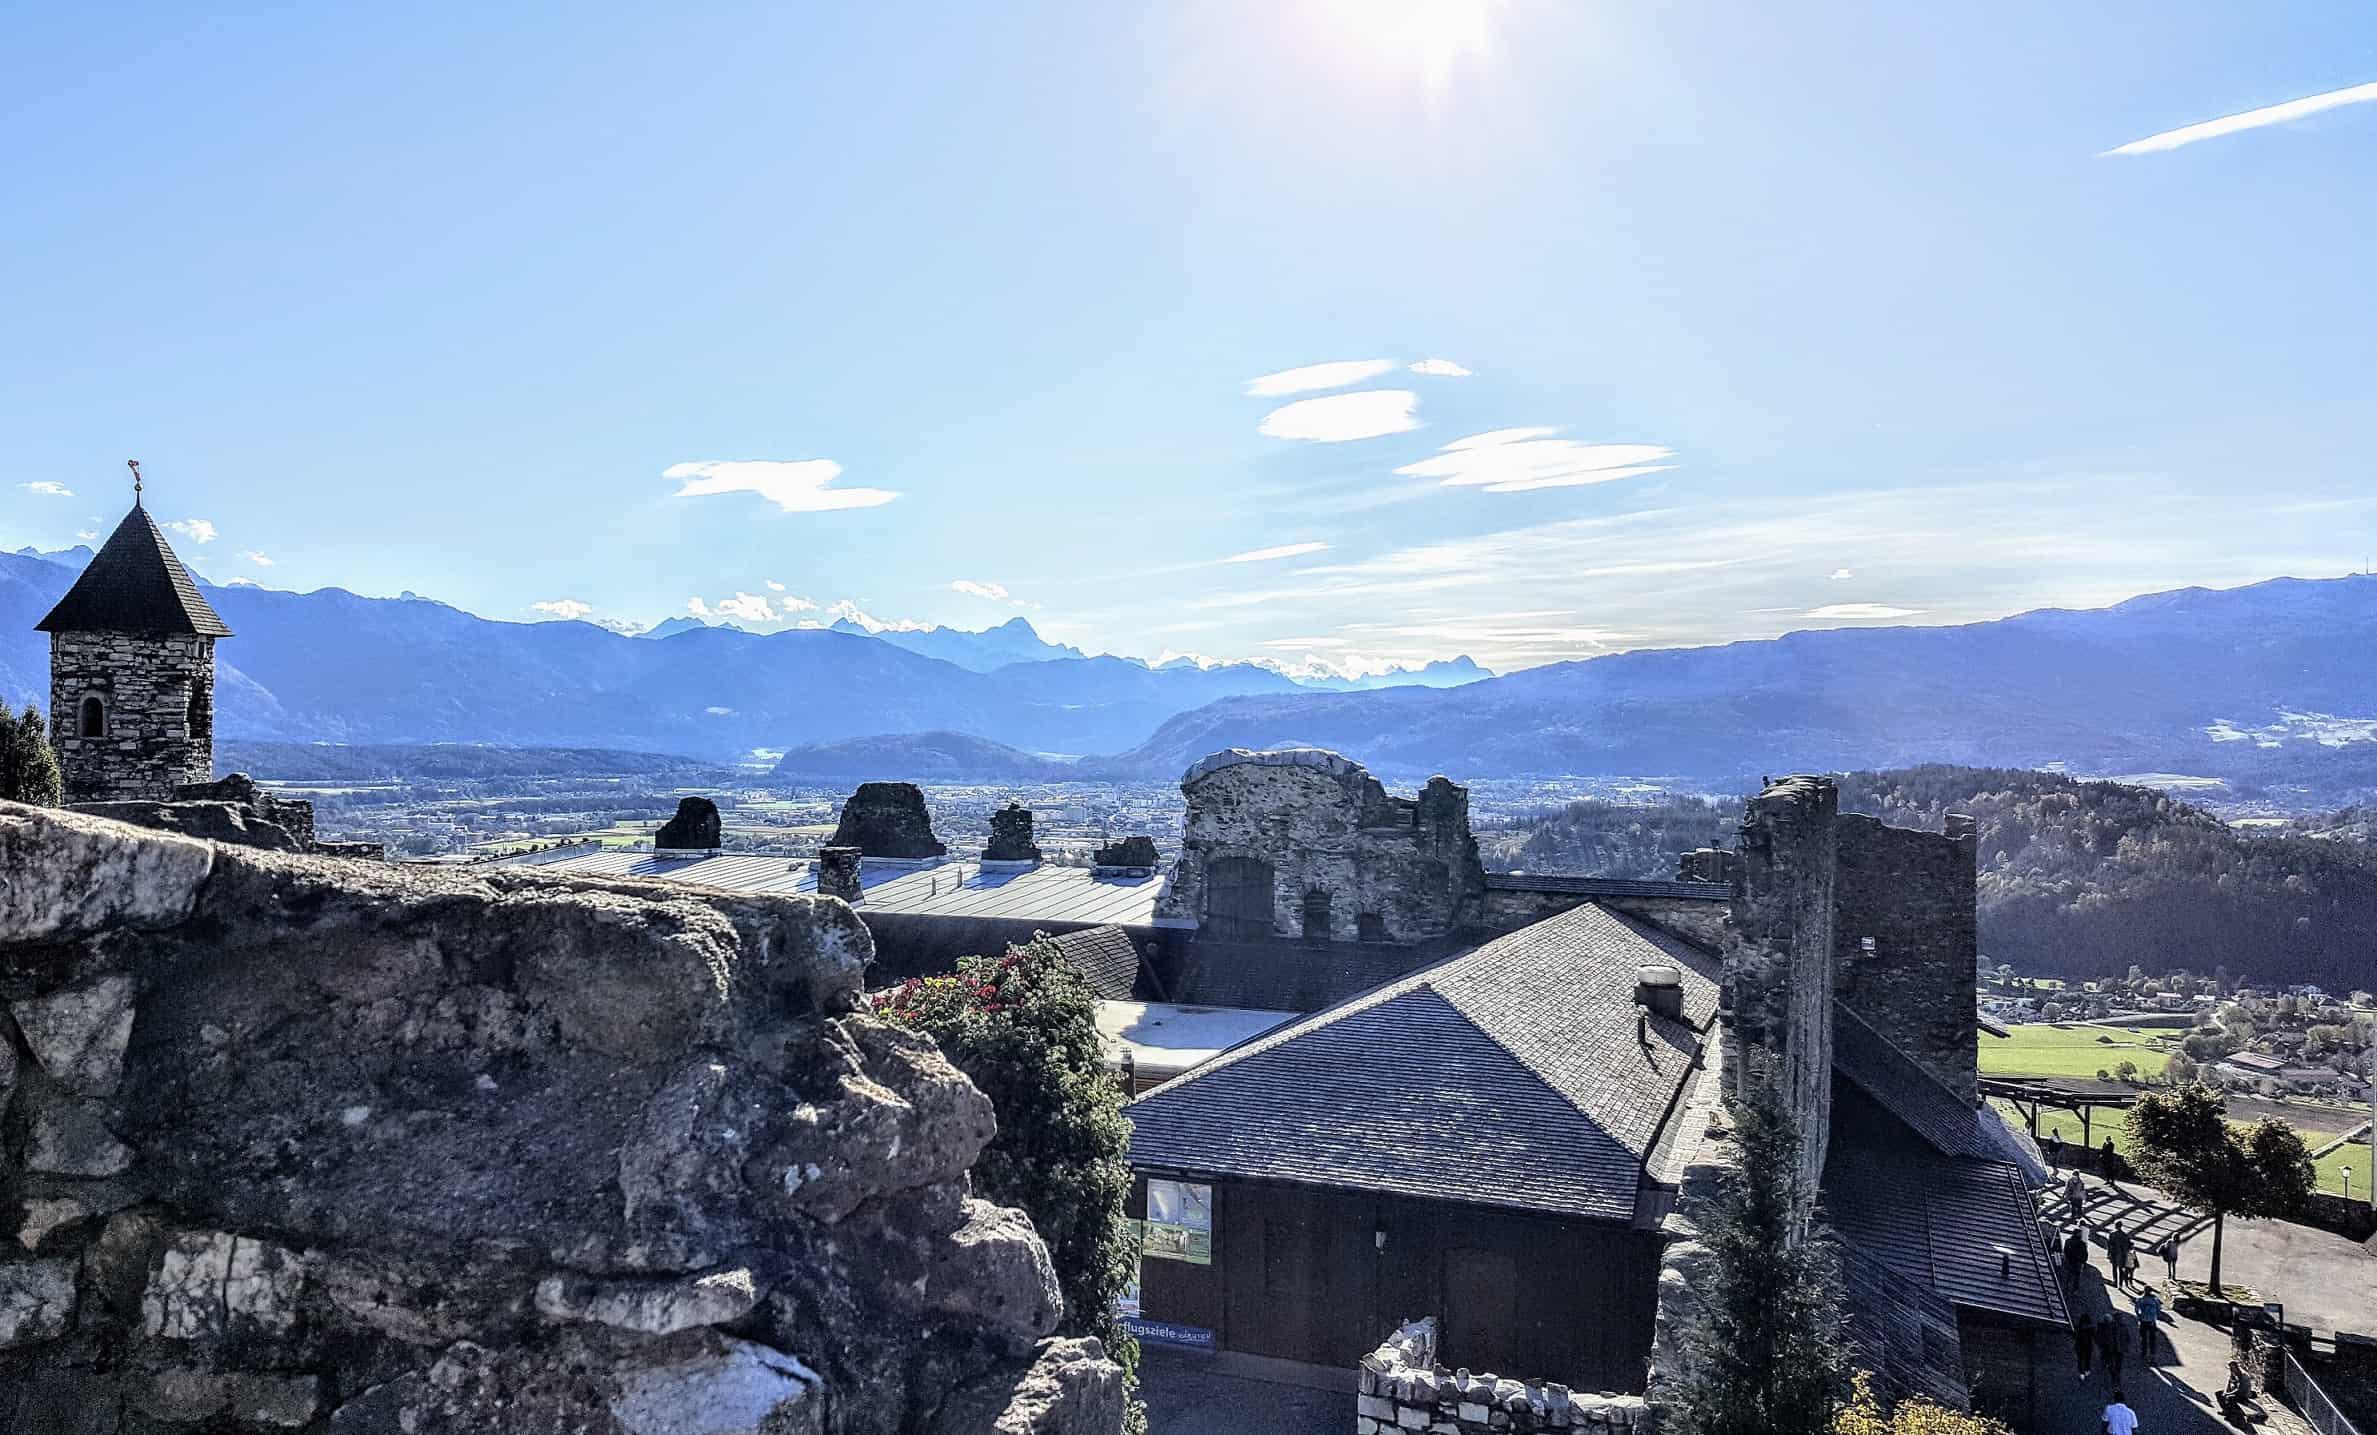 Burgruine Landskron bei Villach am Ossiacher See - Aussicht